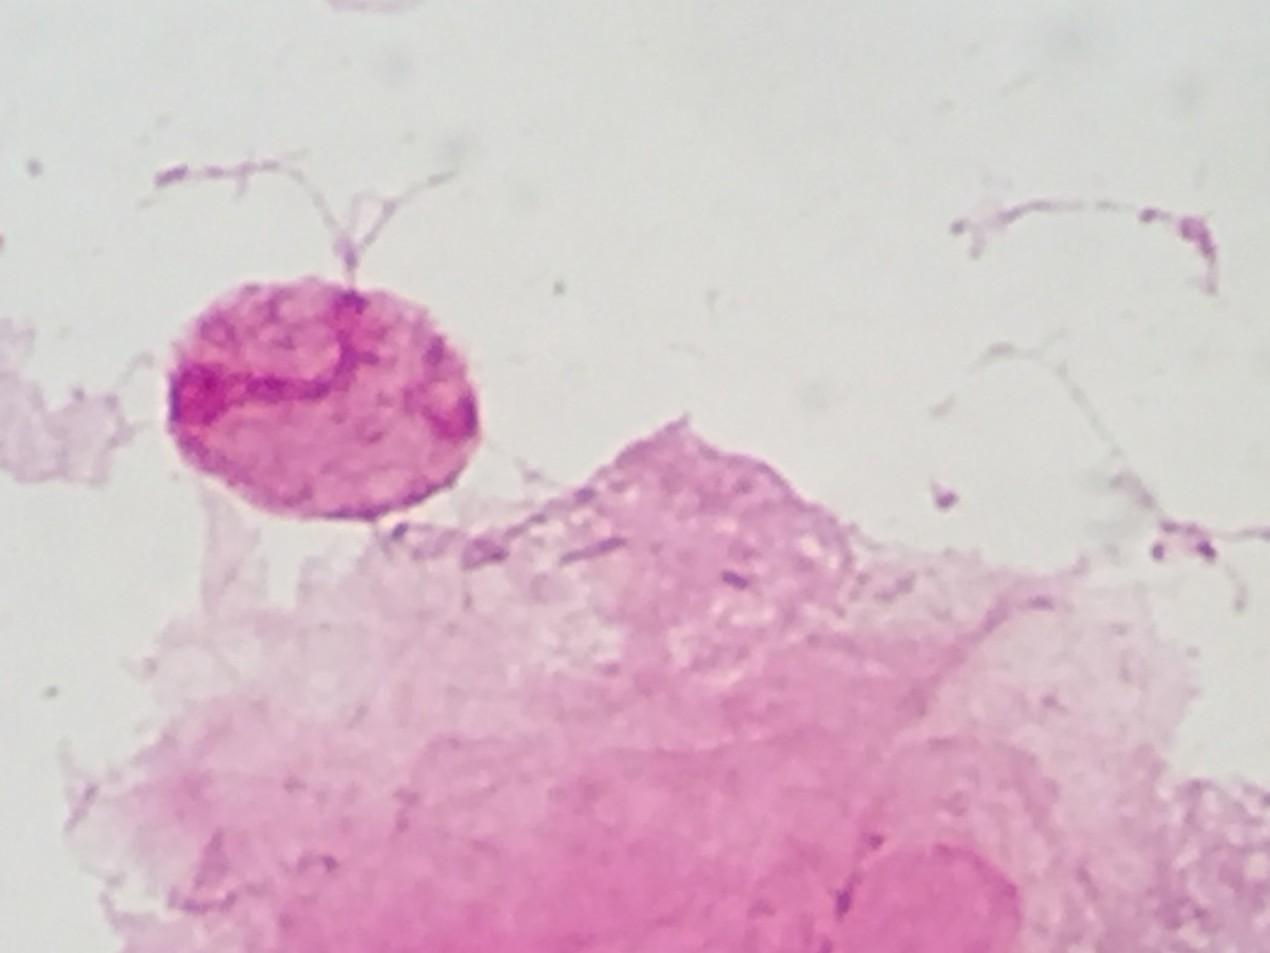 Trichomonas vaginalis 〔トリコモナス〕